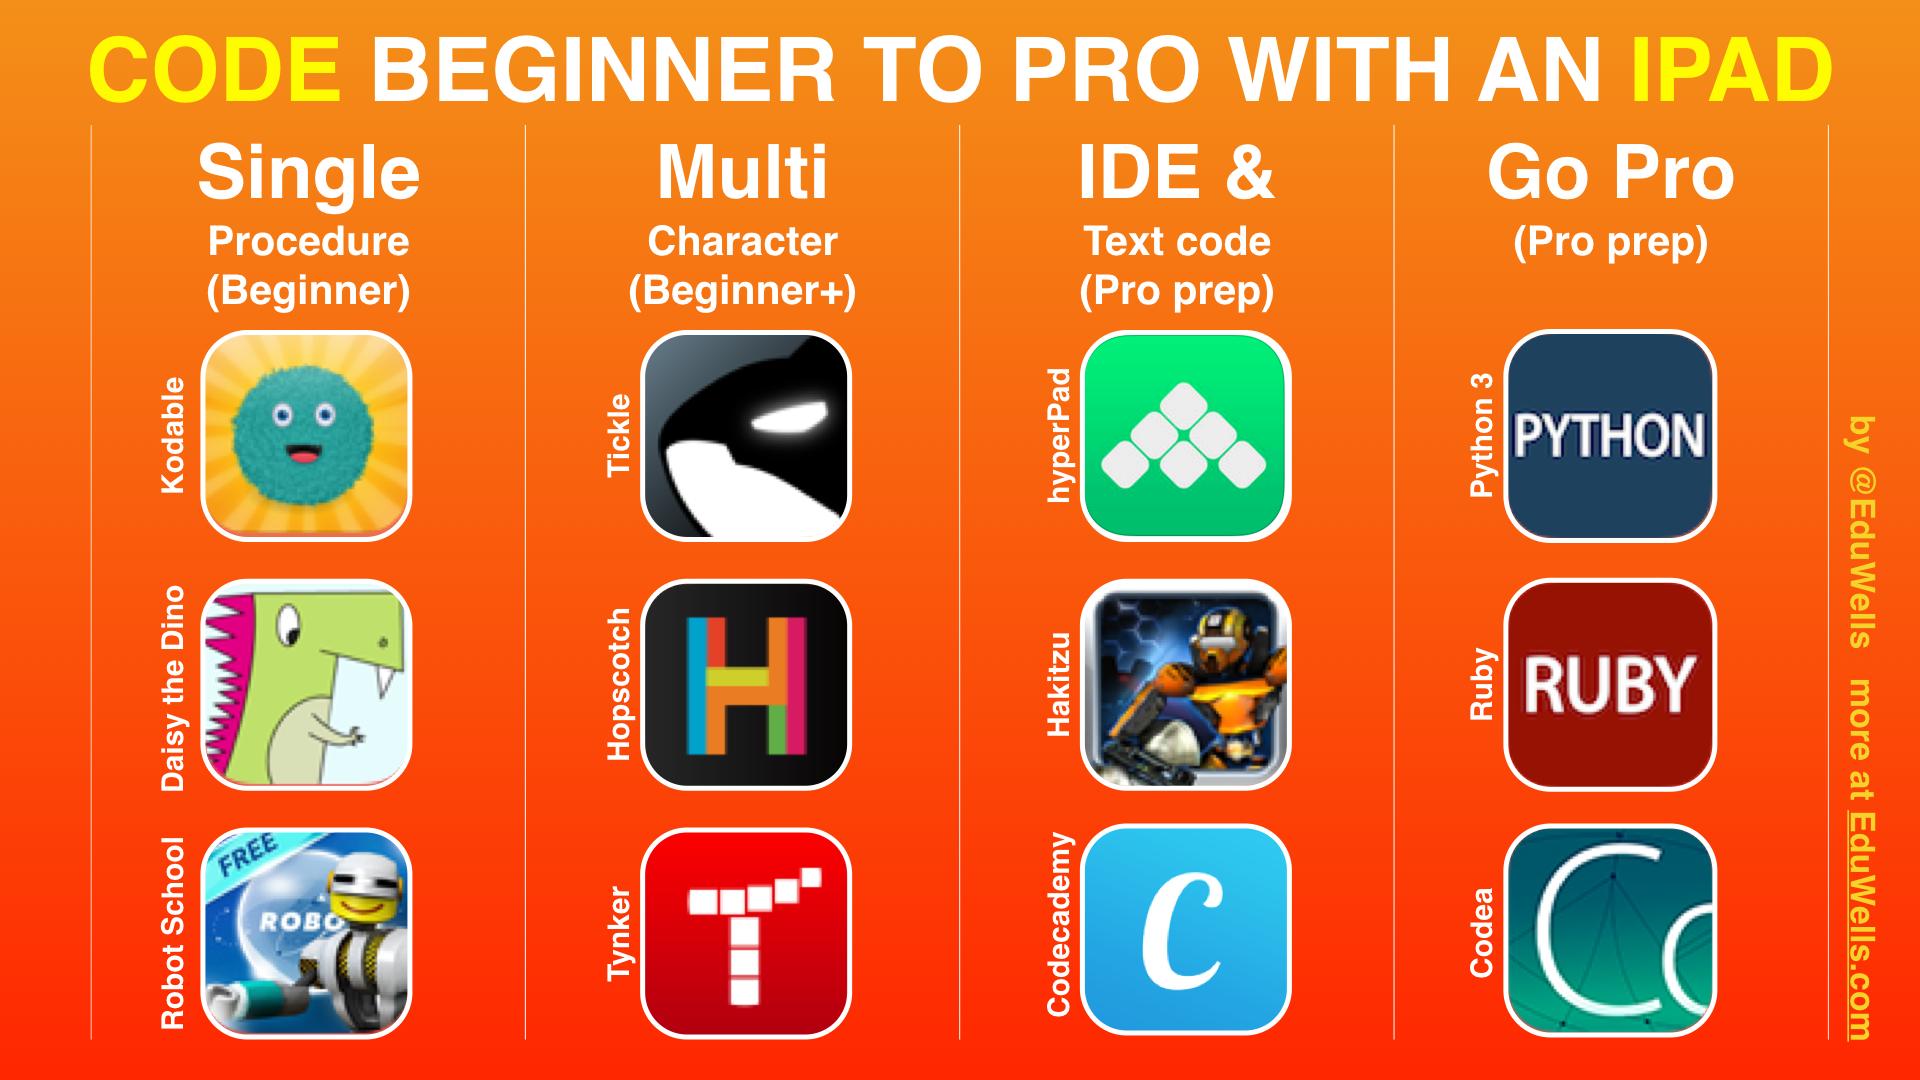 Code Beginner to Pro with iPad-EduWells